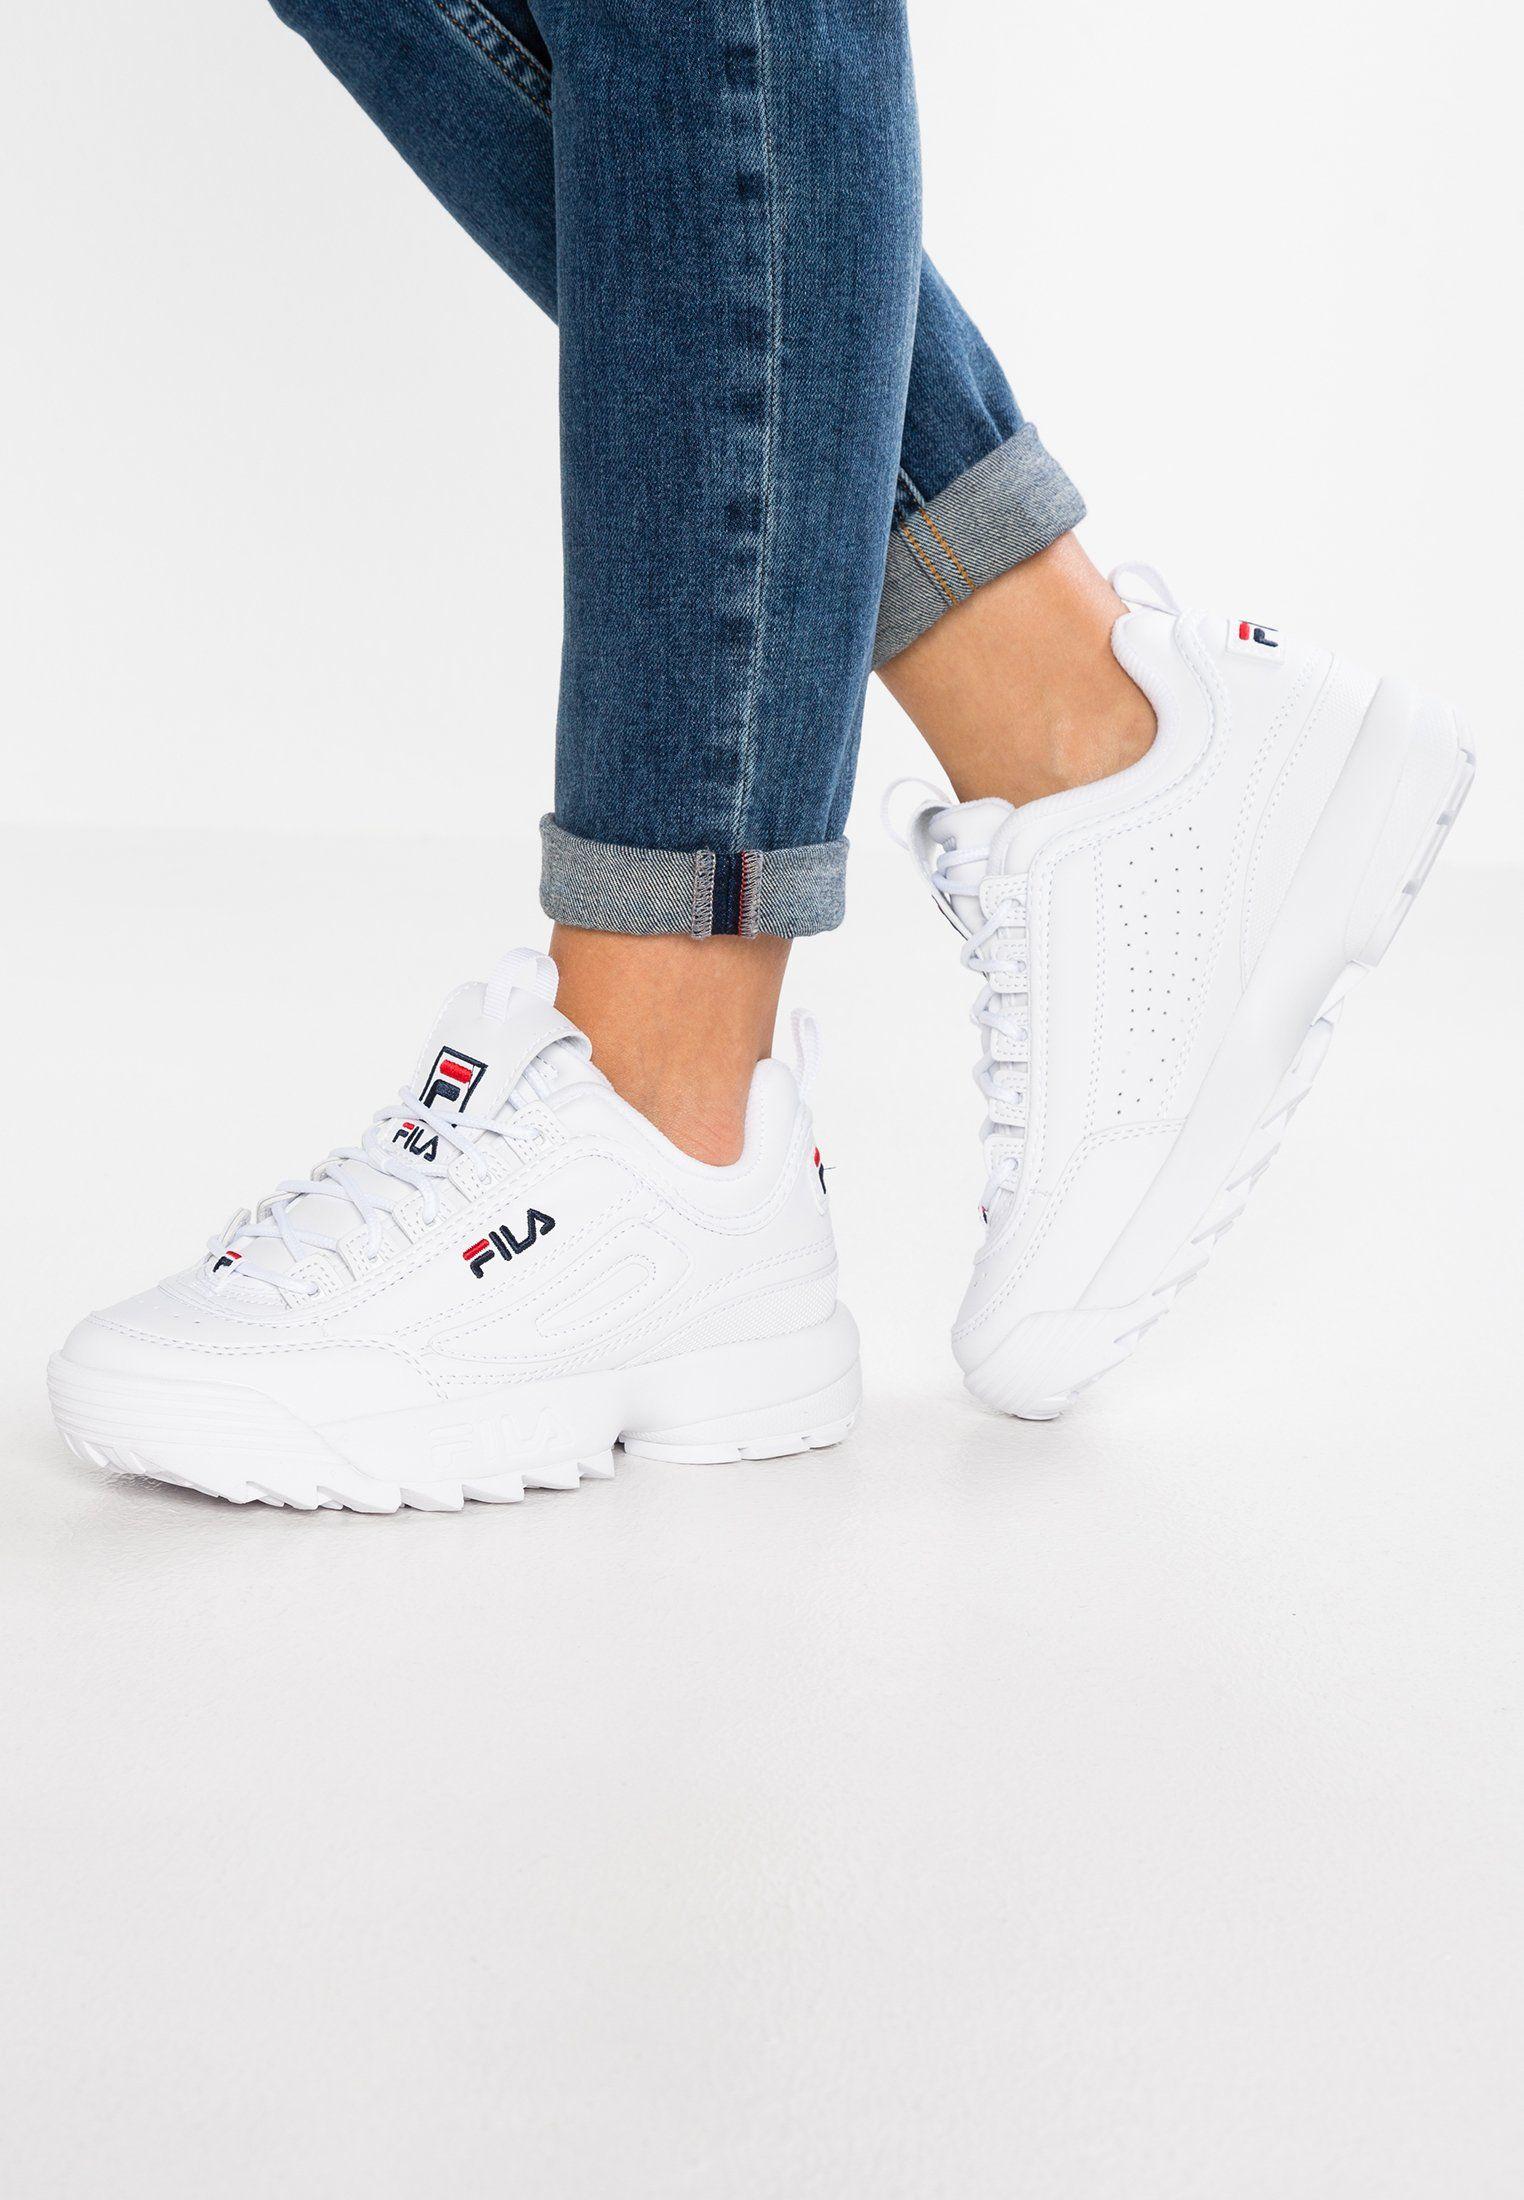 fila chaussure femme zalondo